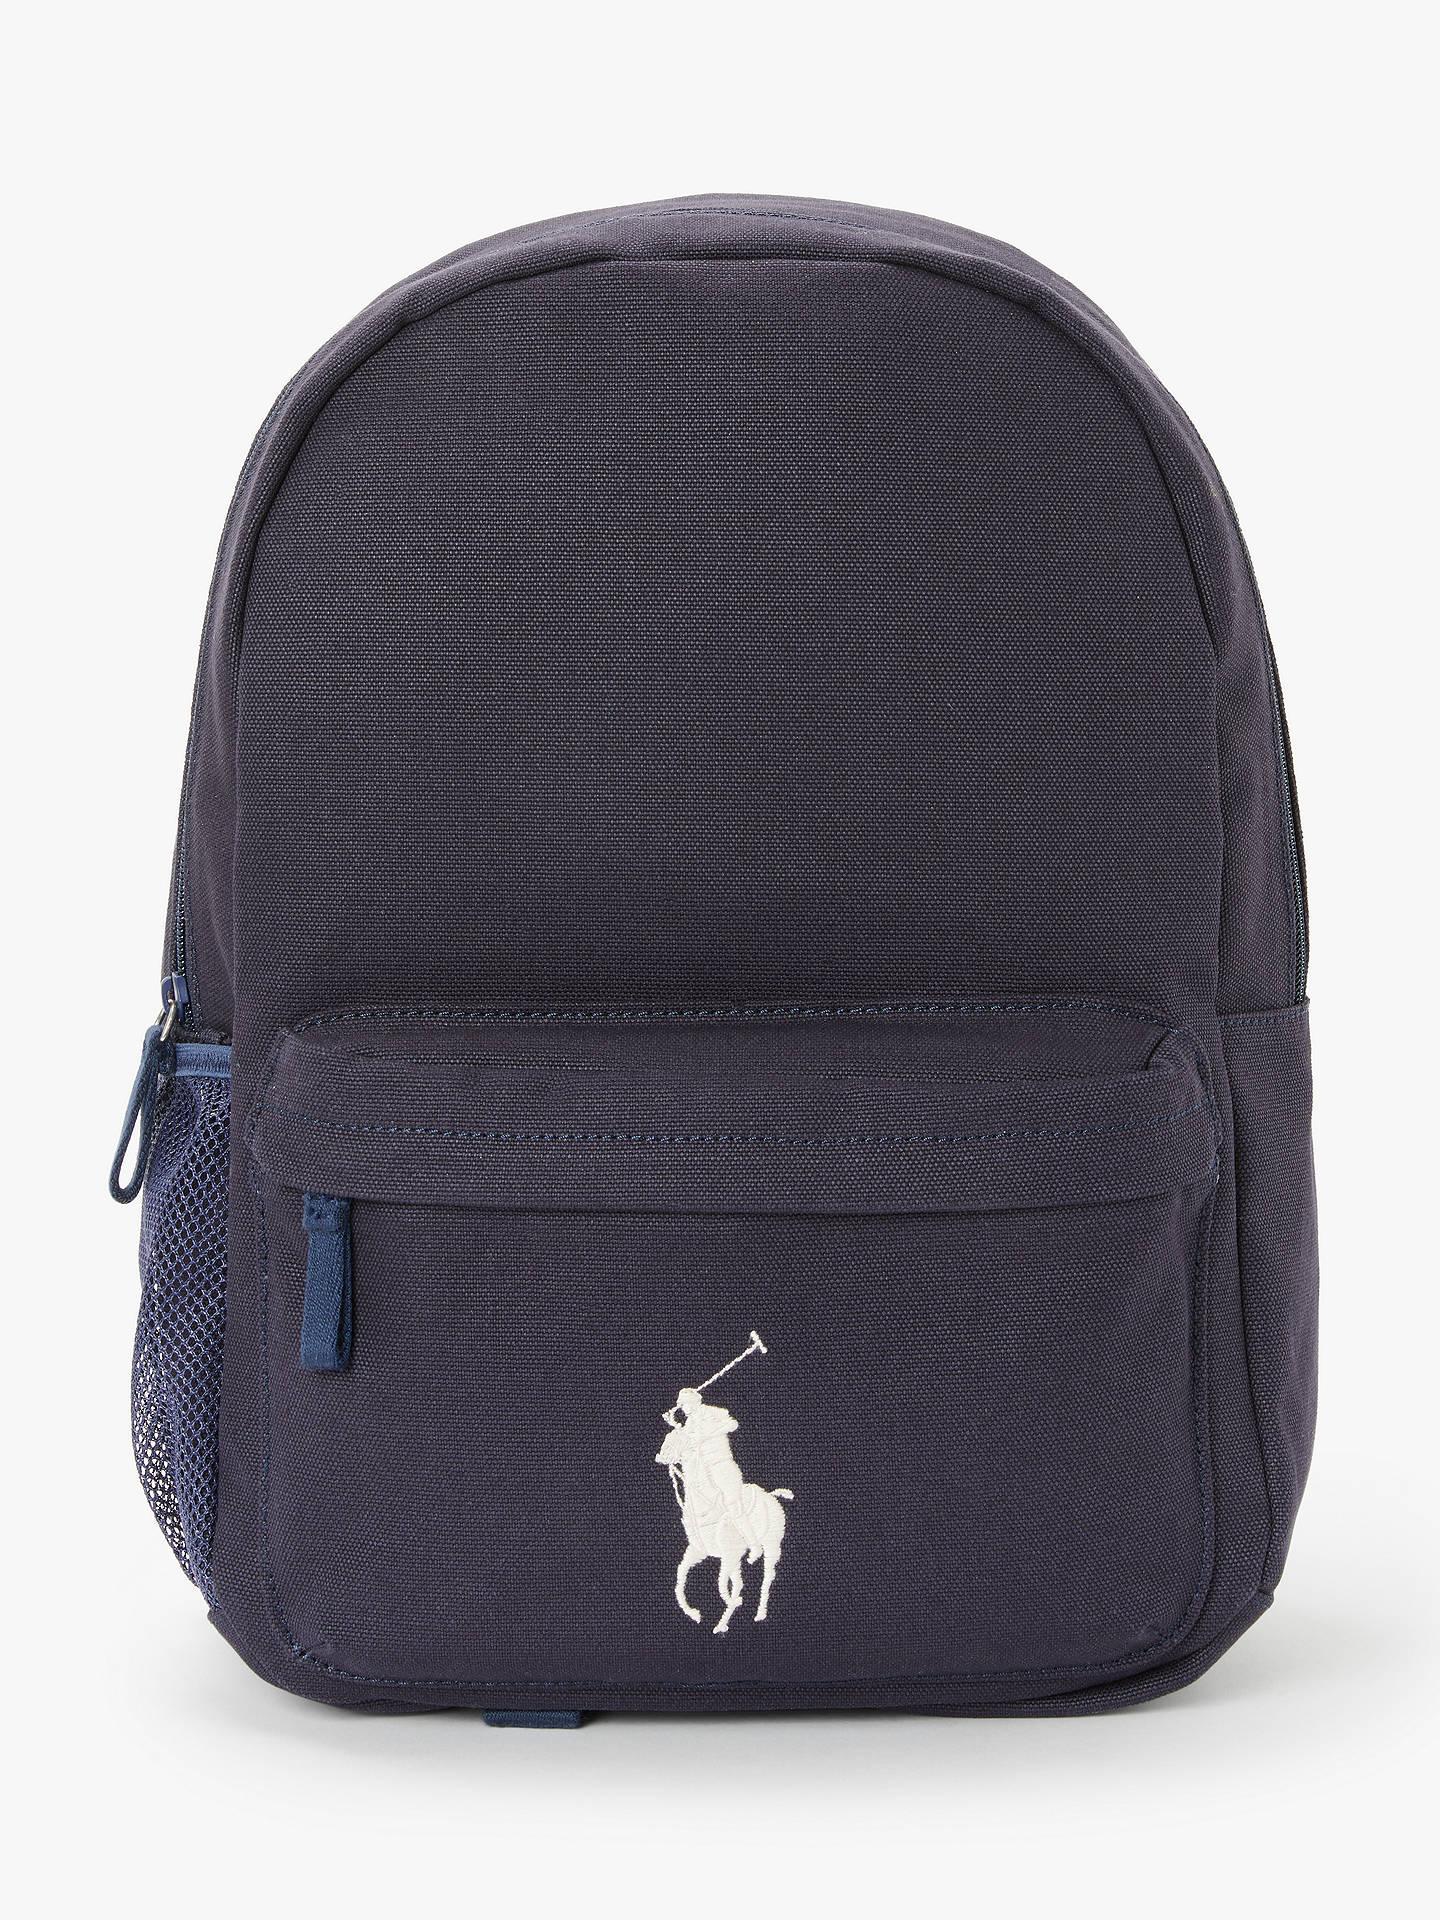 36d41067b Buy Polo Ralph Lauren Children s Backpack